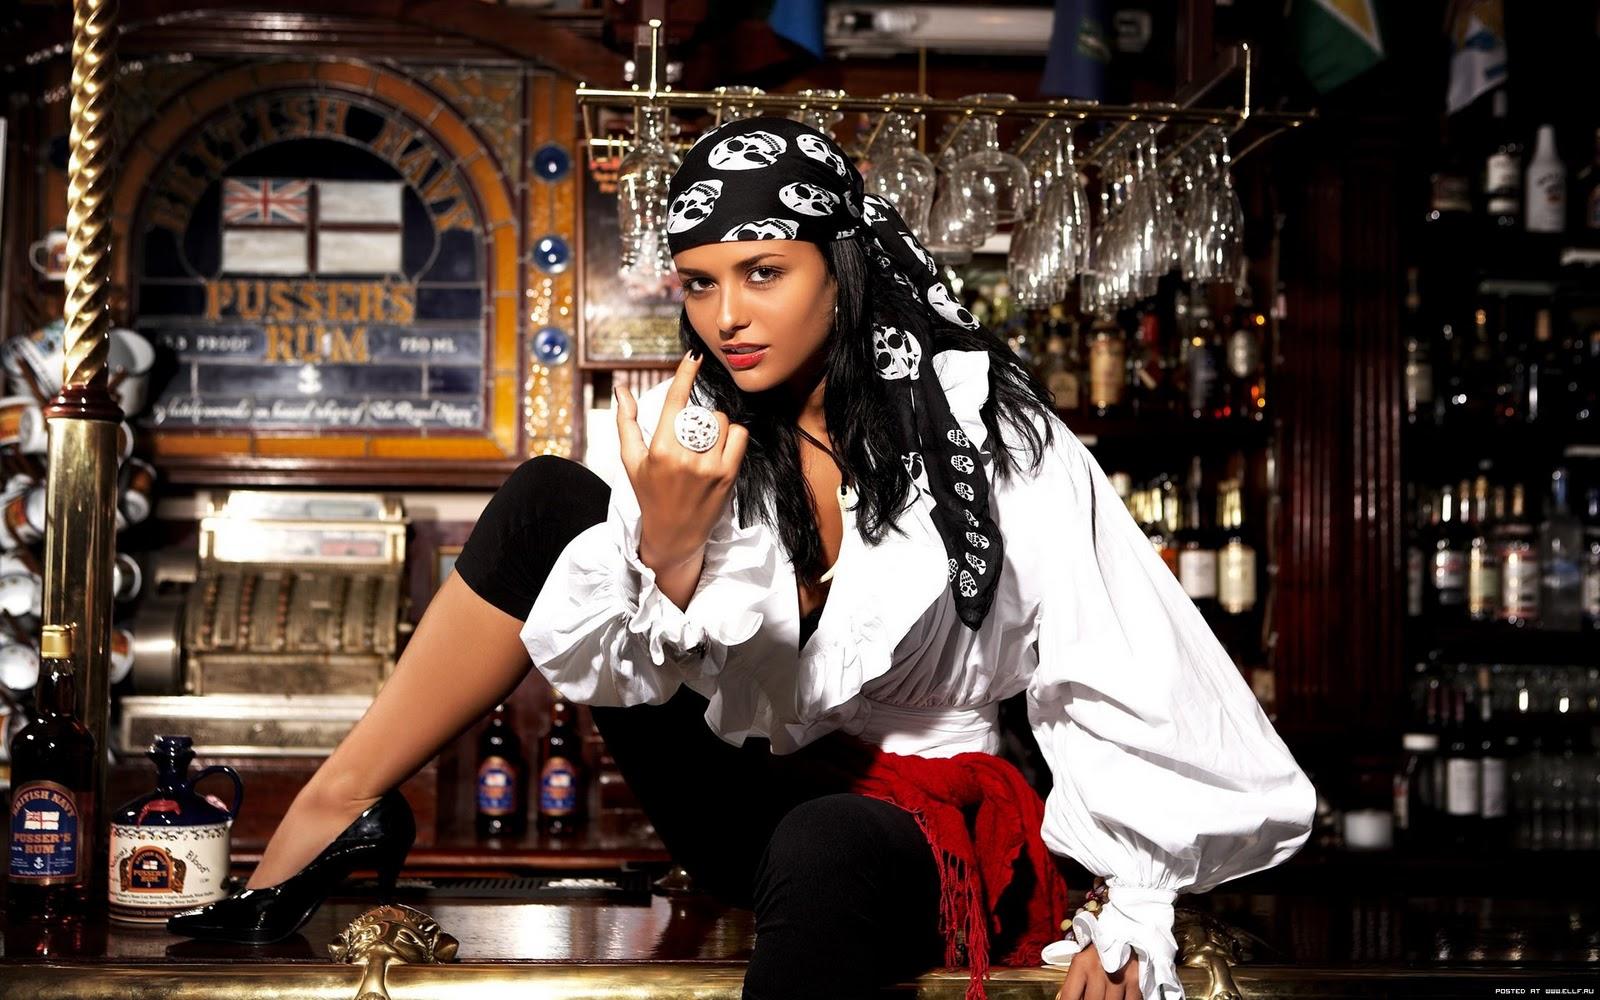 http://3.bp.blogspot.com/_Y5-4Z4aPcOI/TTSq57-vbRI/AAAAAAAAALE/iRiRcbBwijk/s1600/Sexy+Girl+Pirates+Wallpaper+.jpg